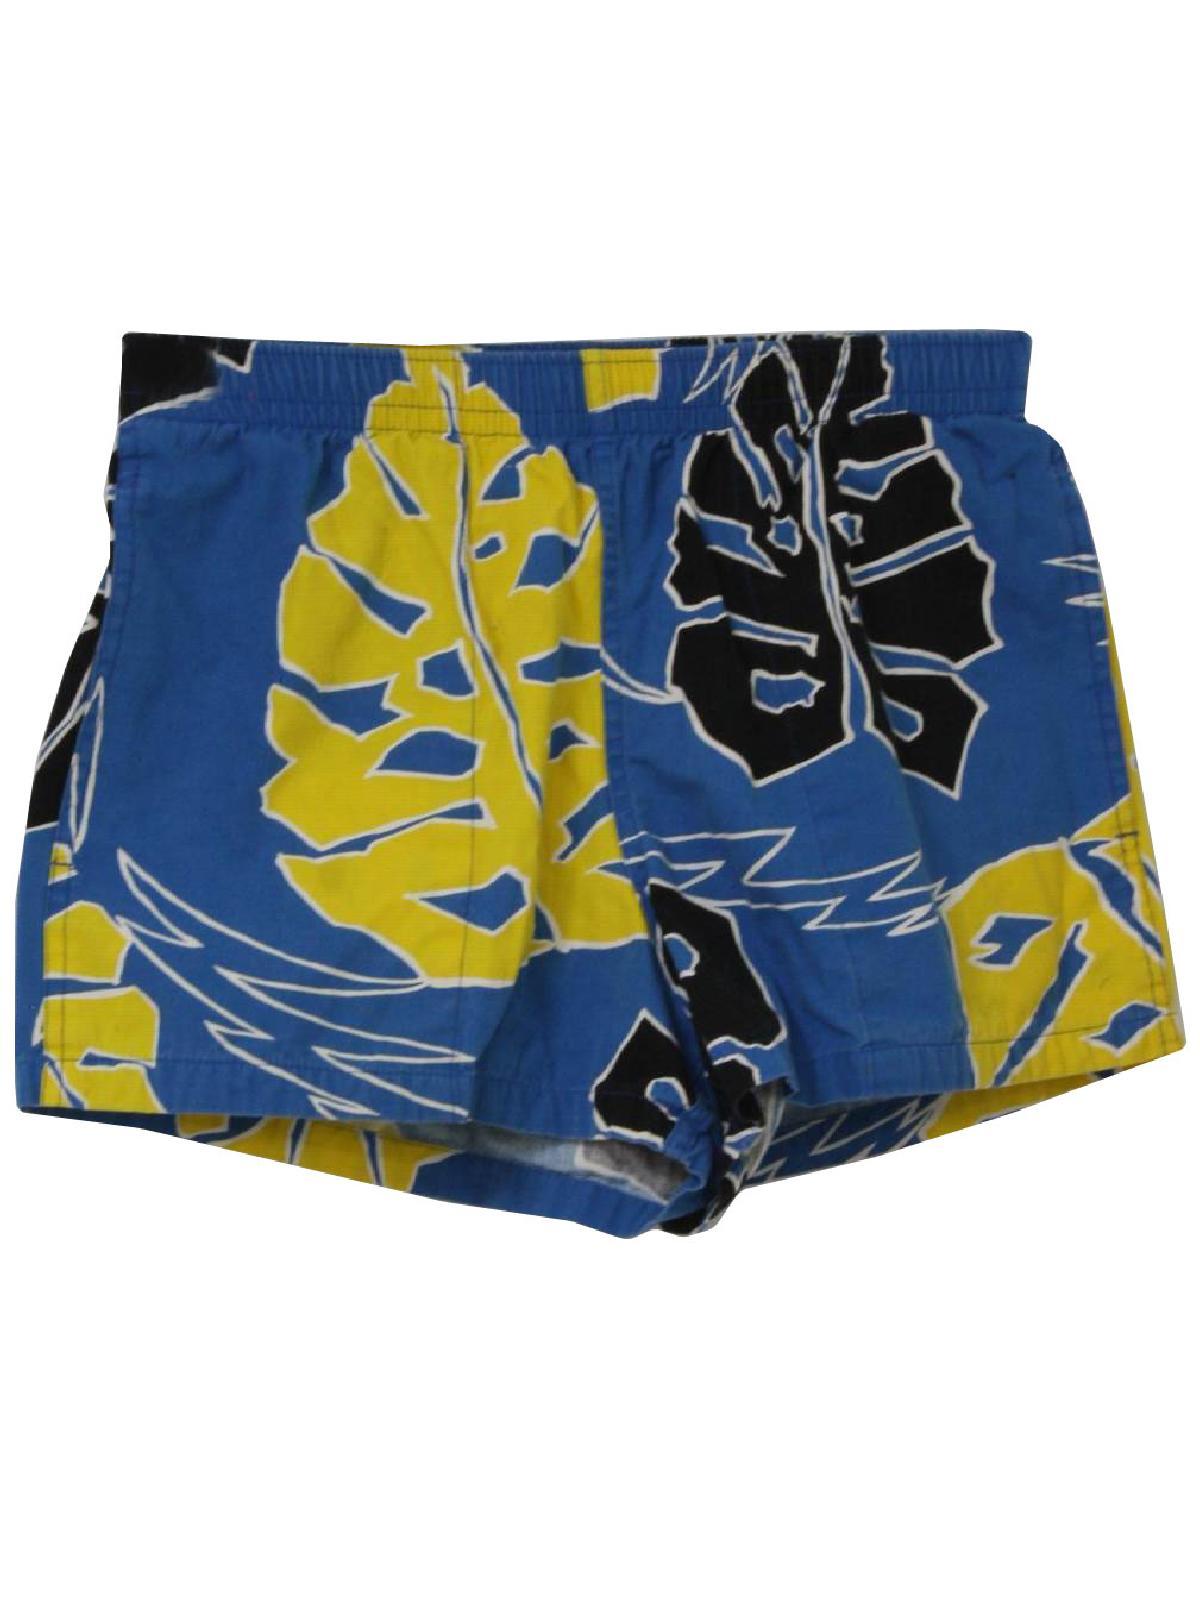 medium 80/'s tie print swim trunks